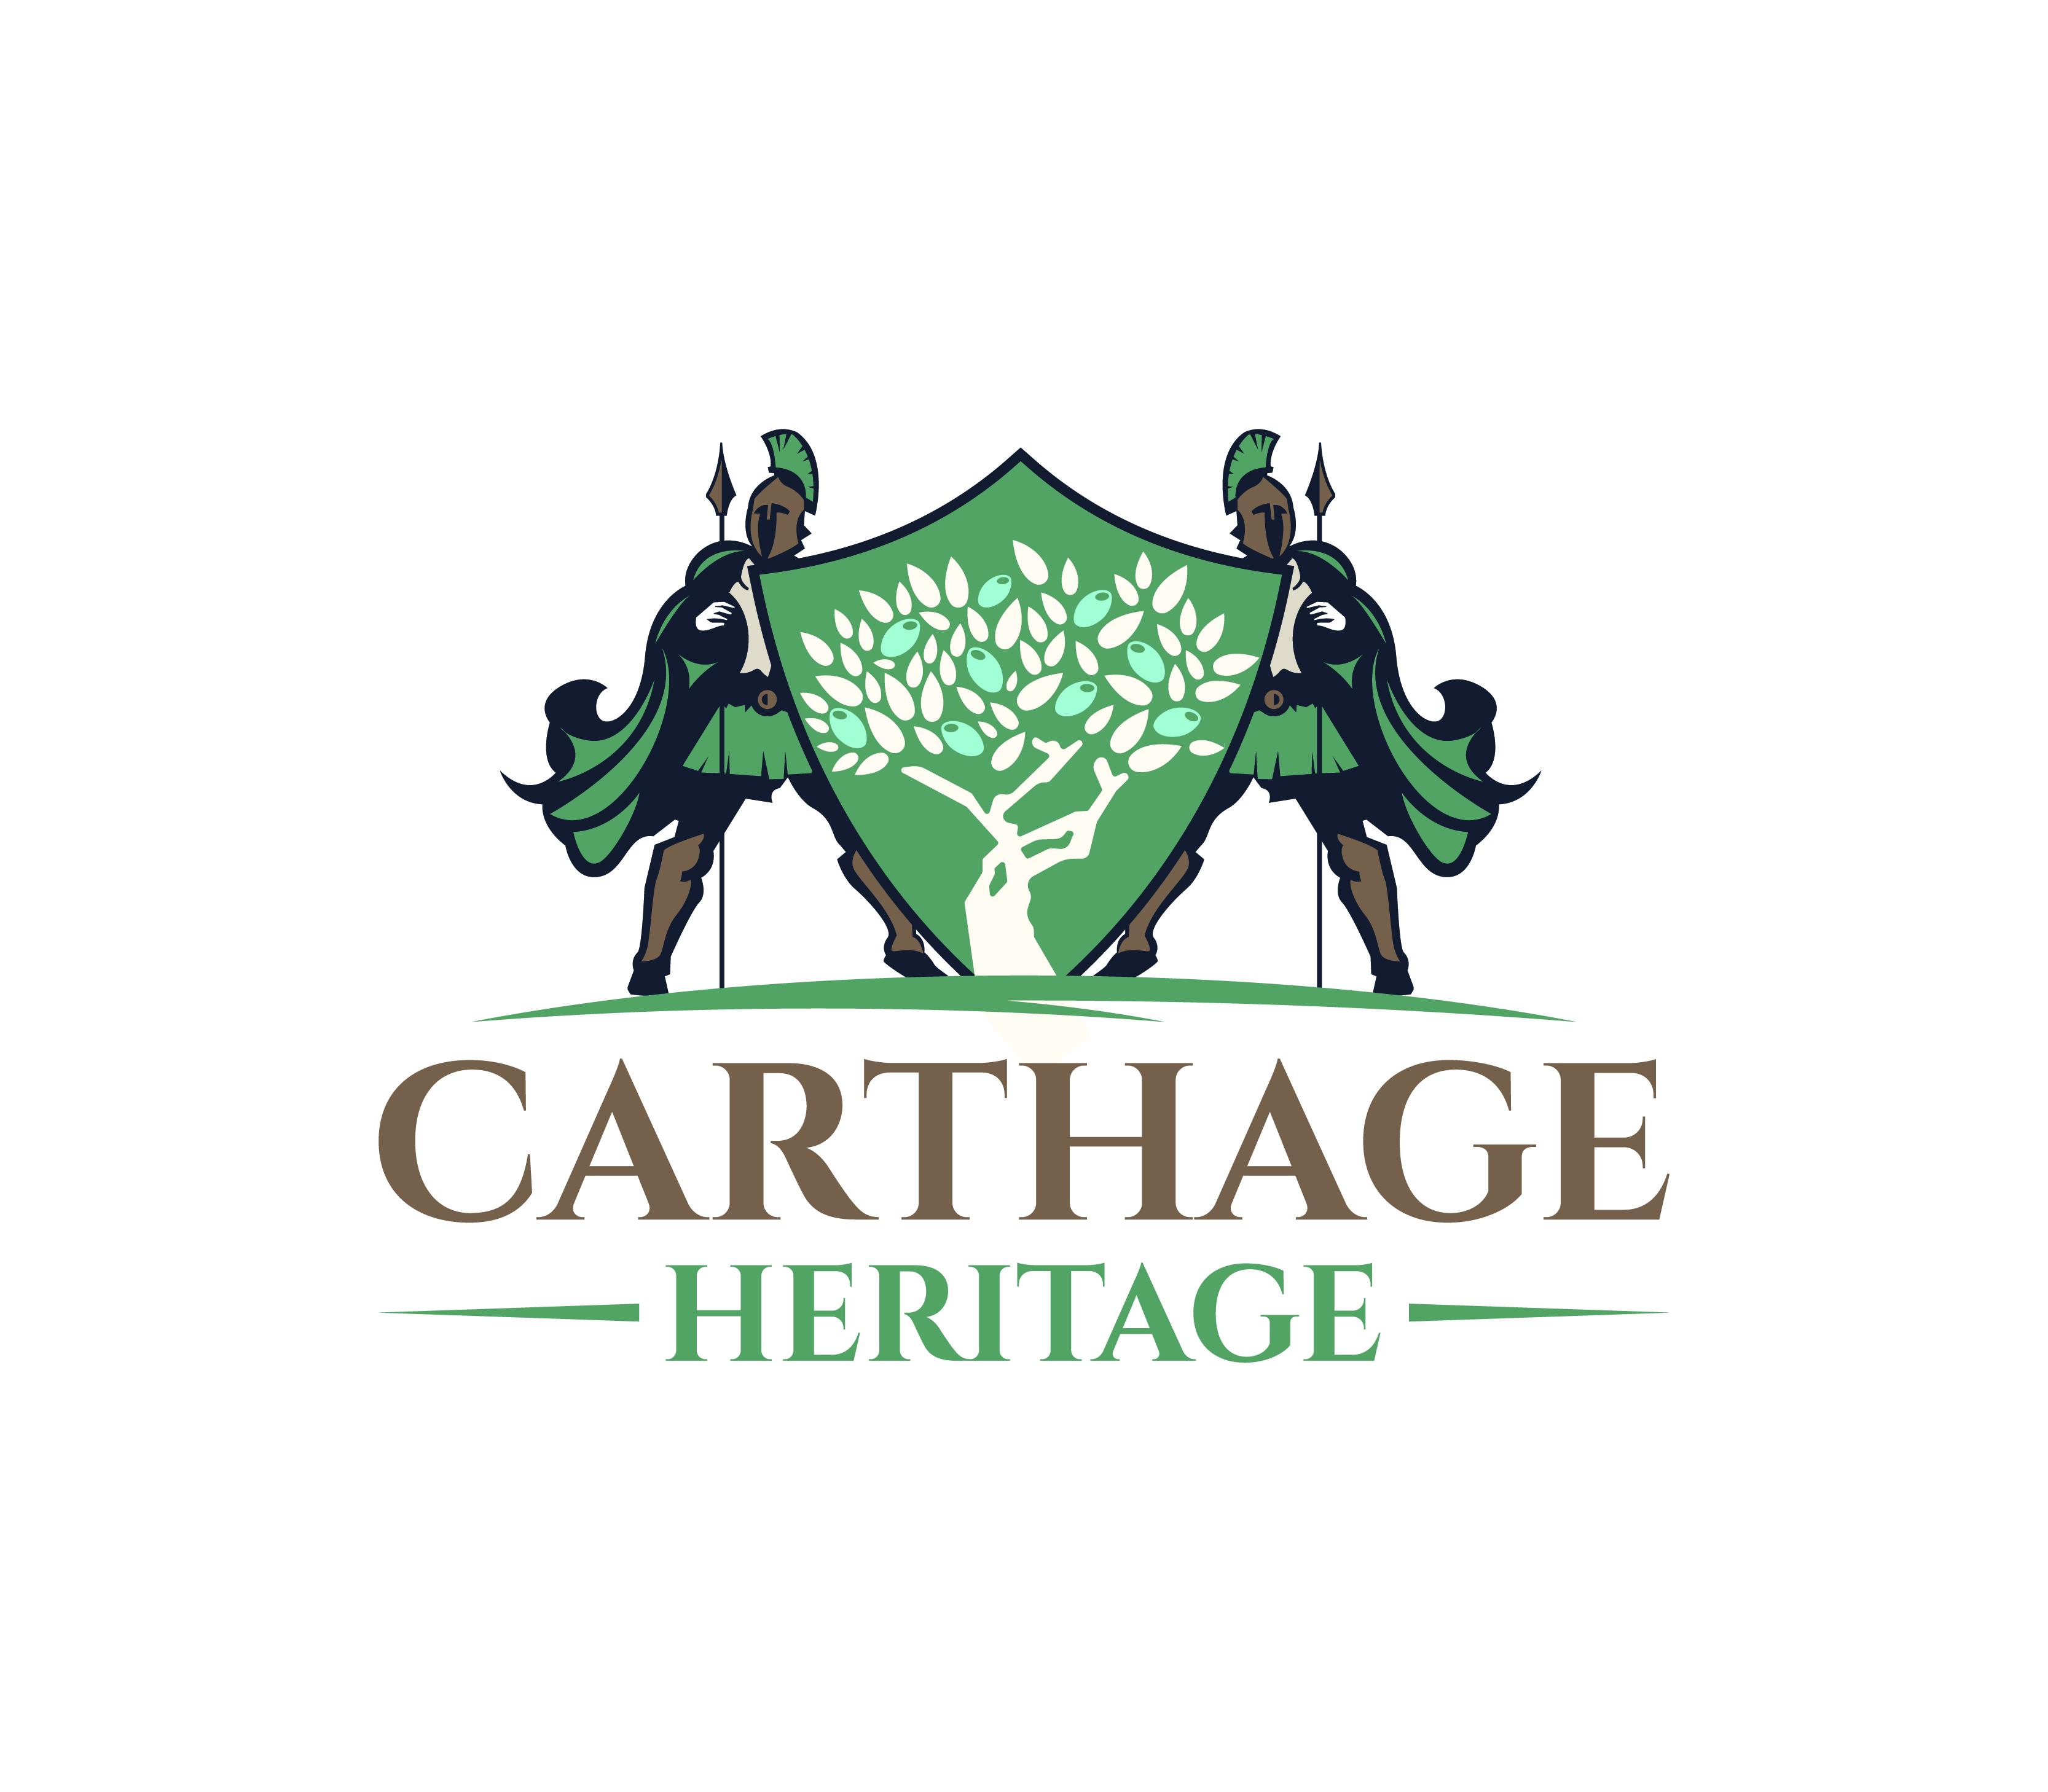 CARTHAGE HERITAGE